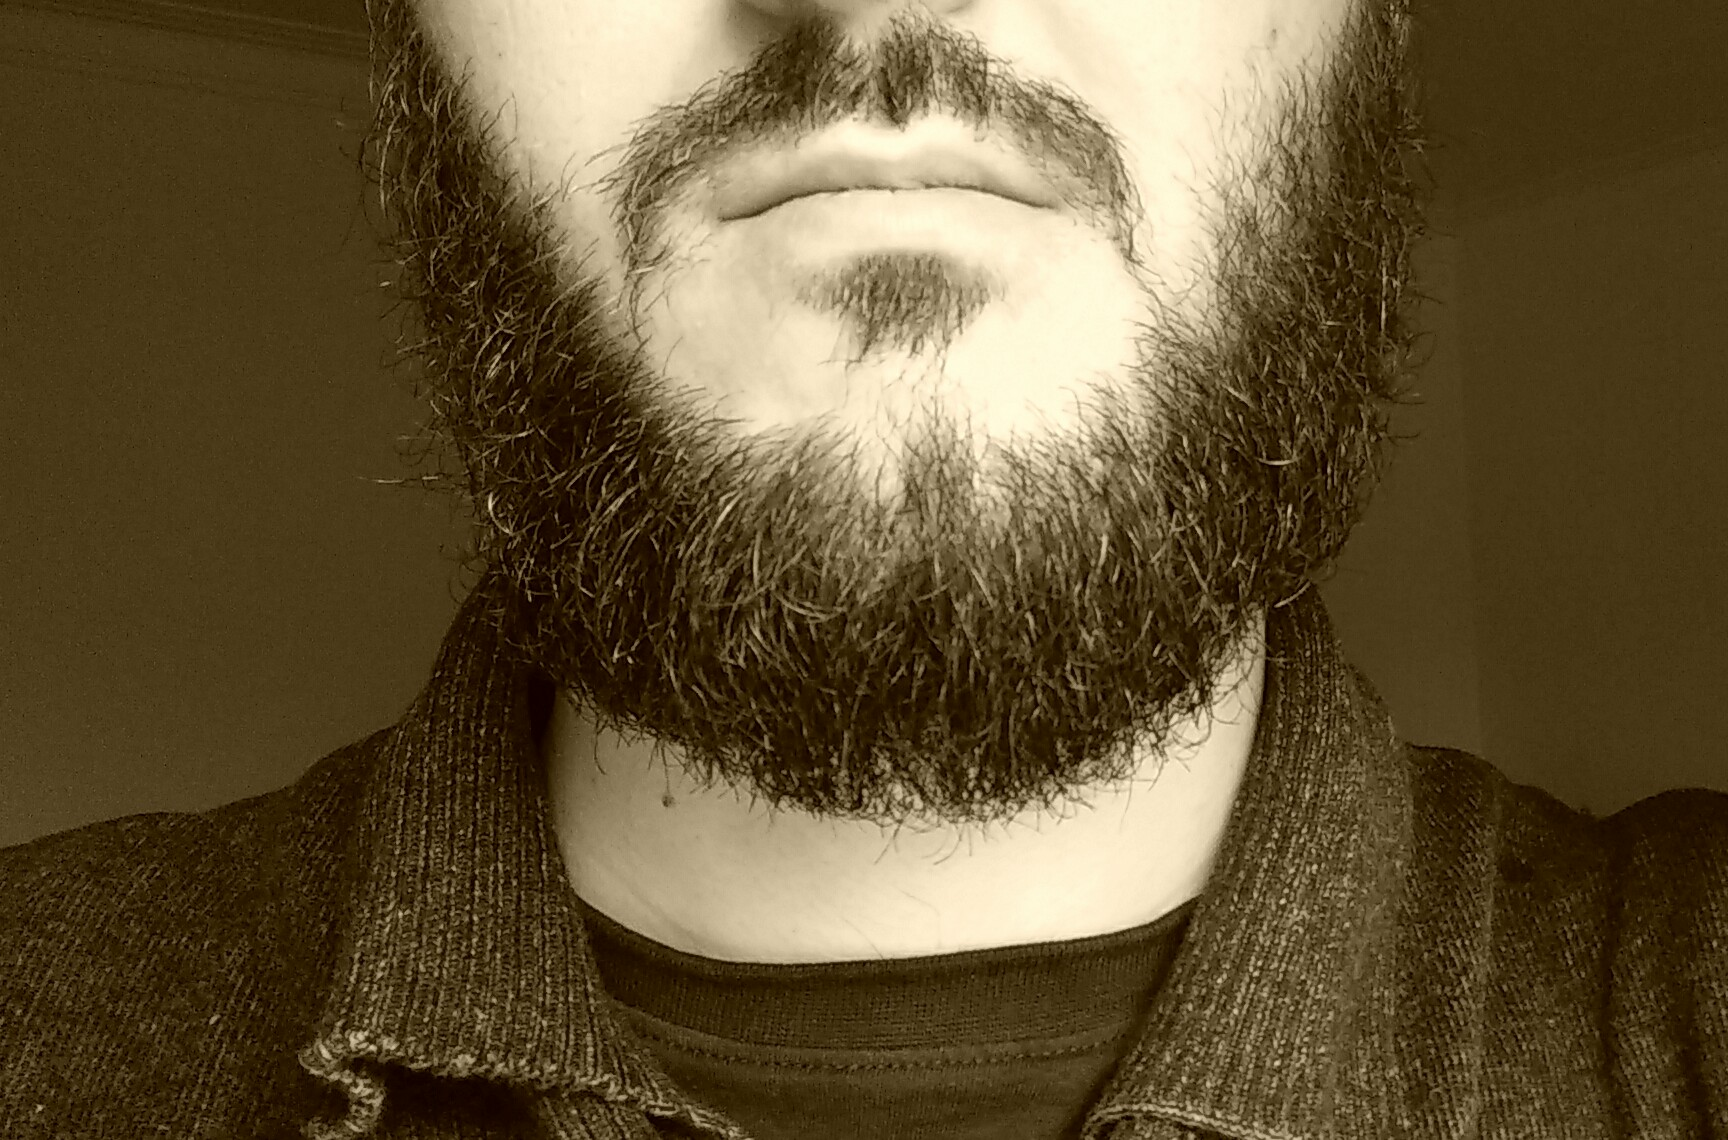 Beard Backgrounds on Wallpapers Vista